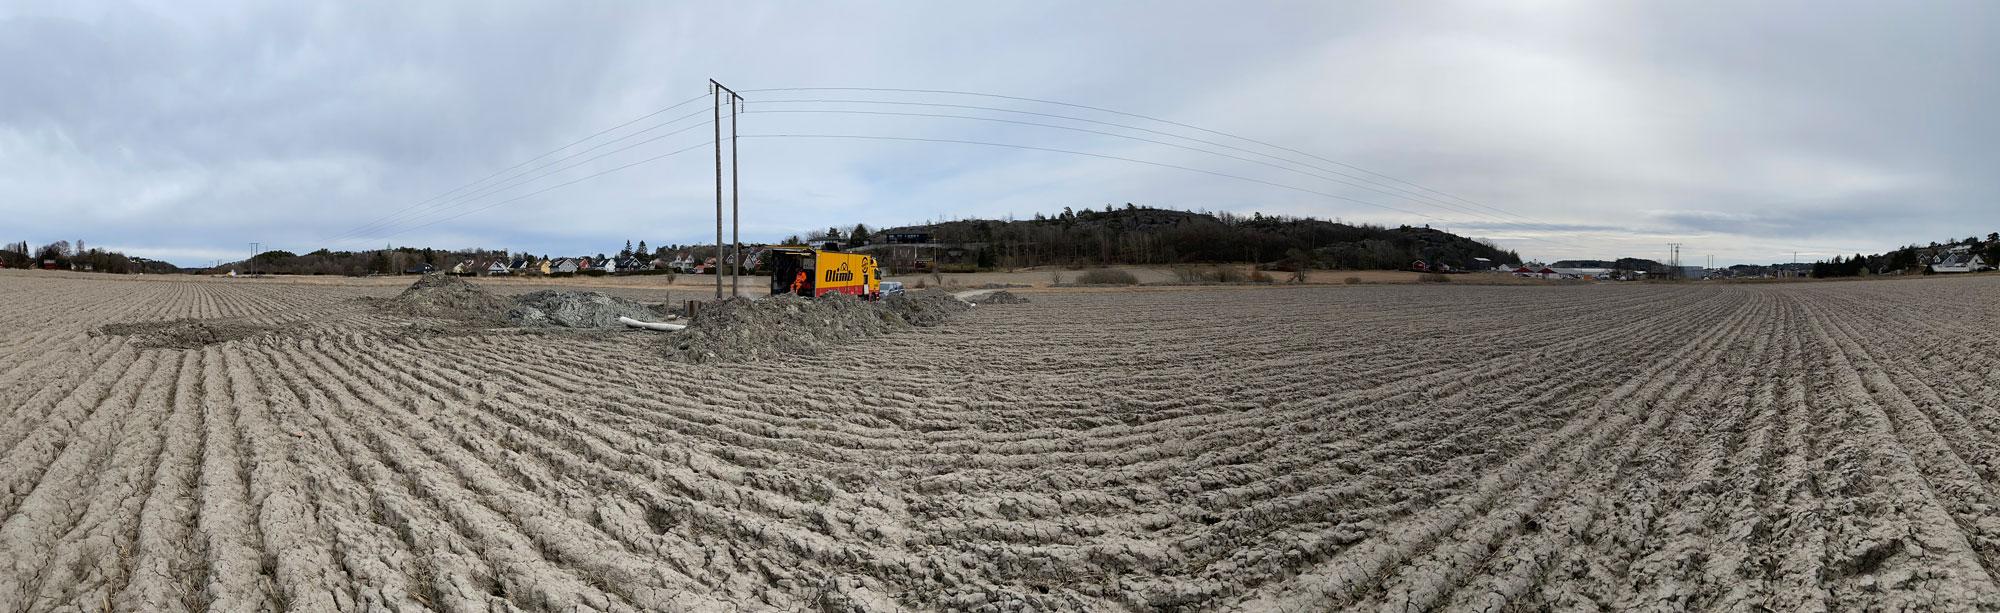 Rehabilitering av vannledning under jorder på Gressvik